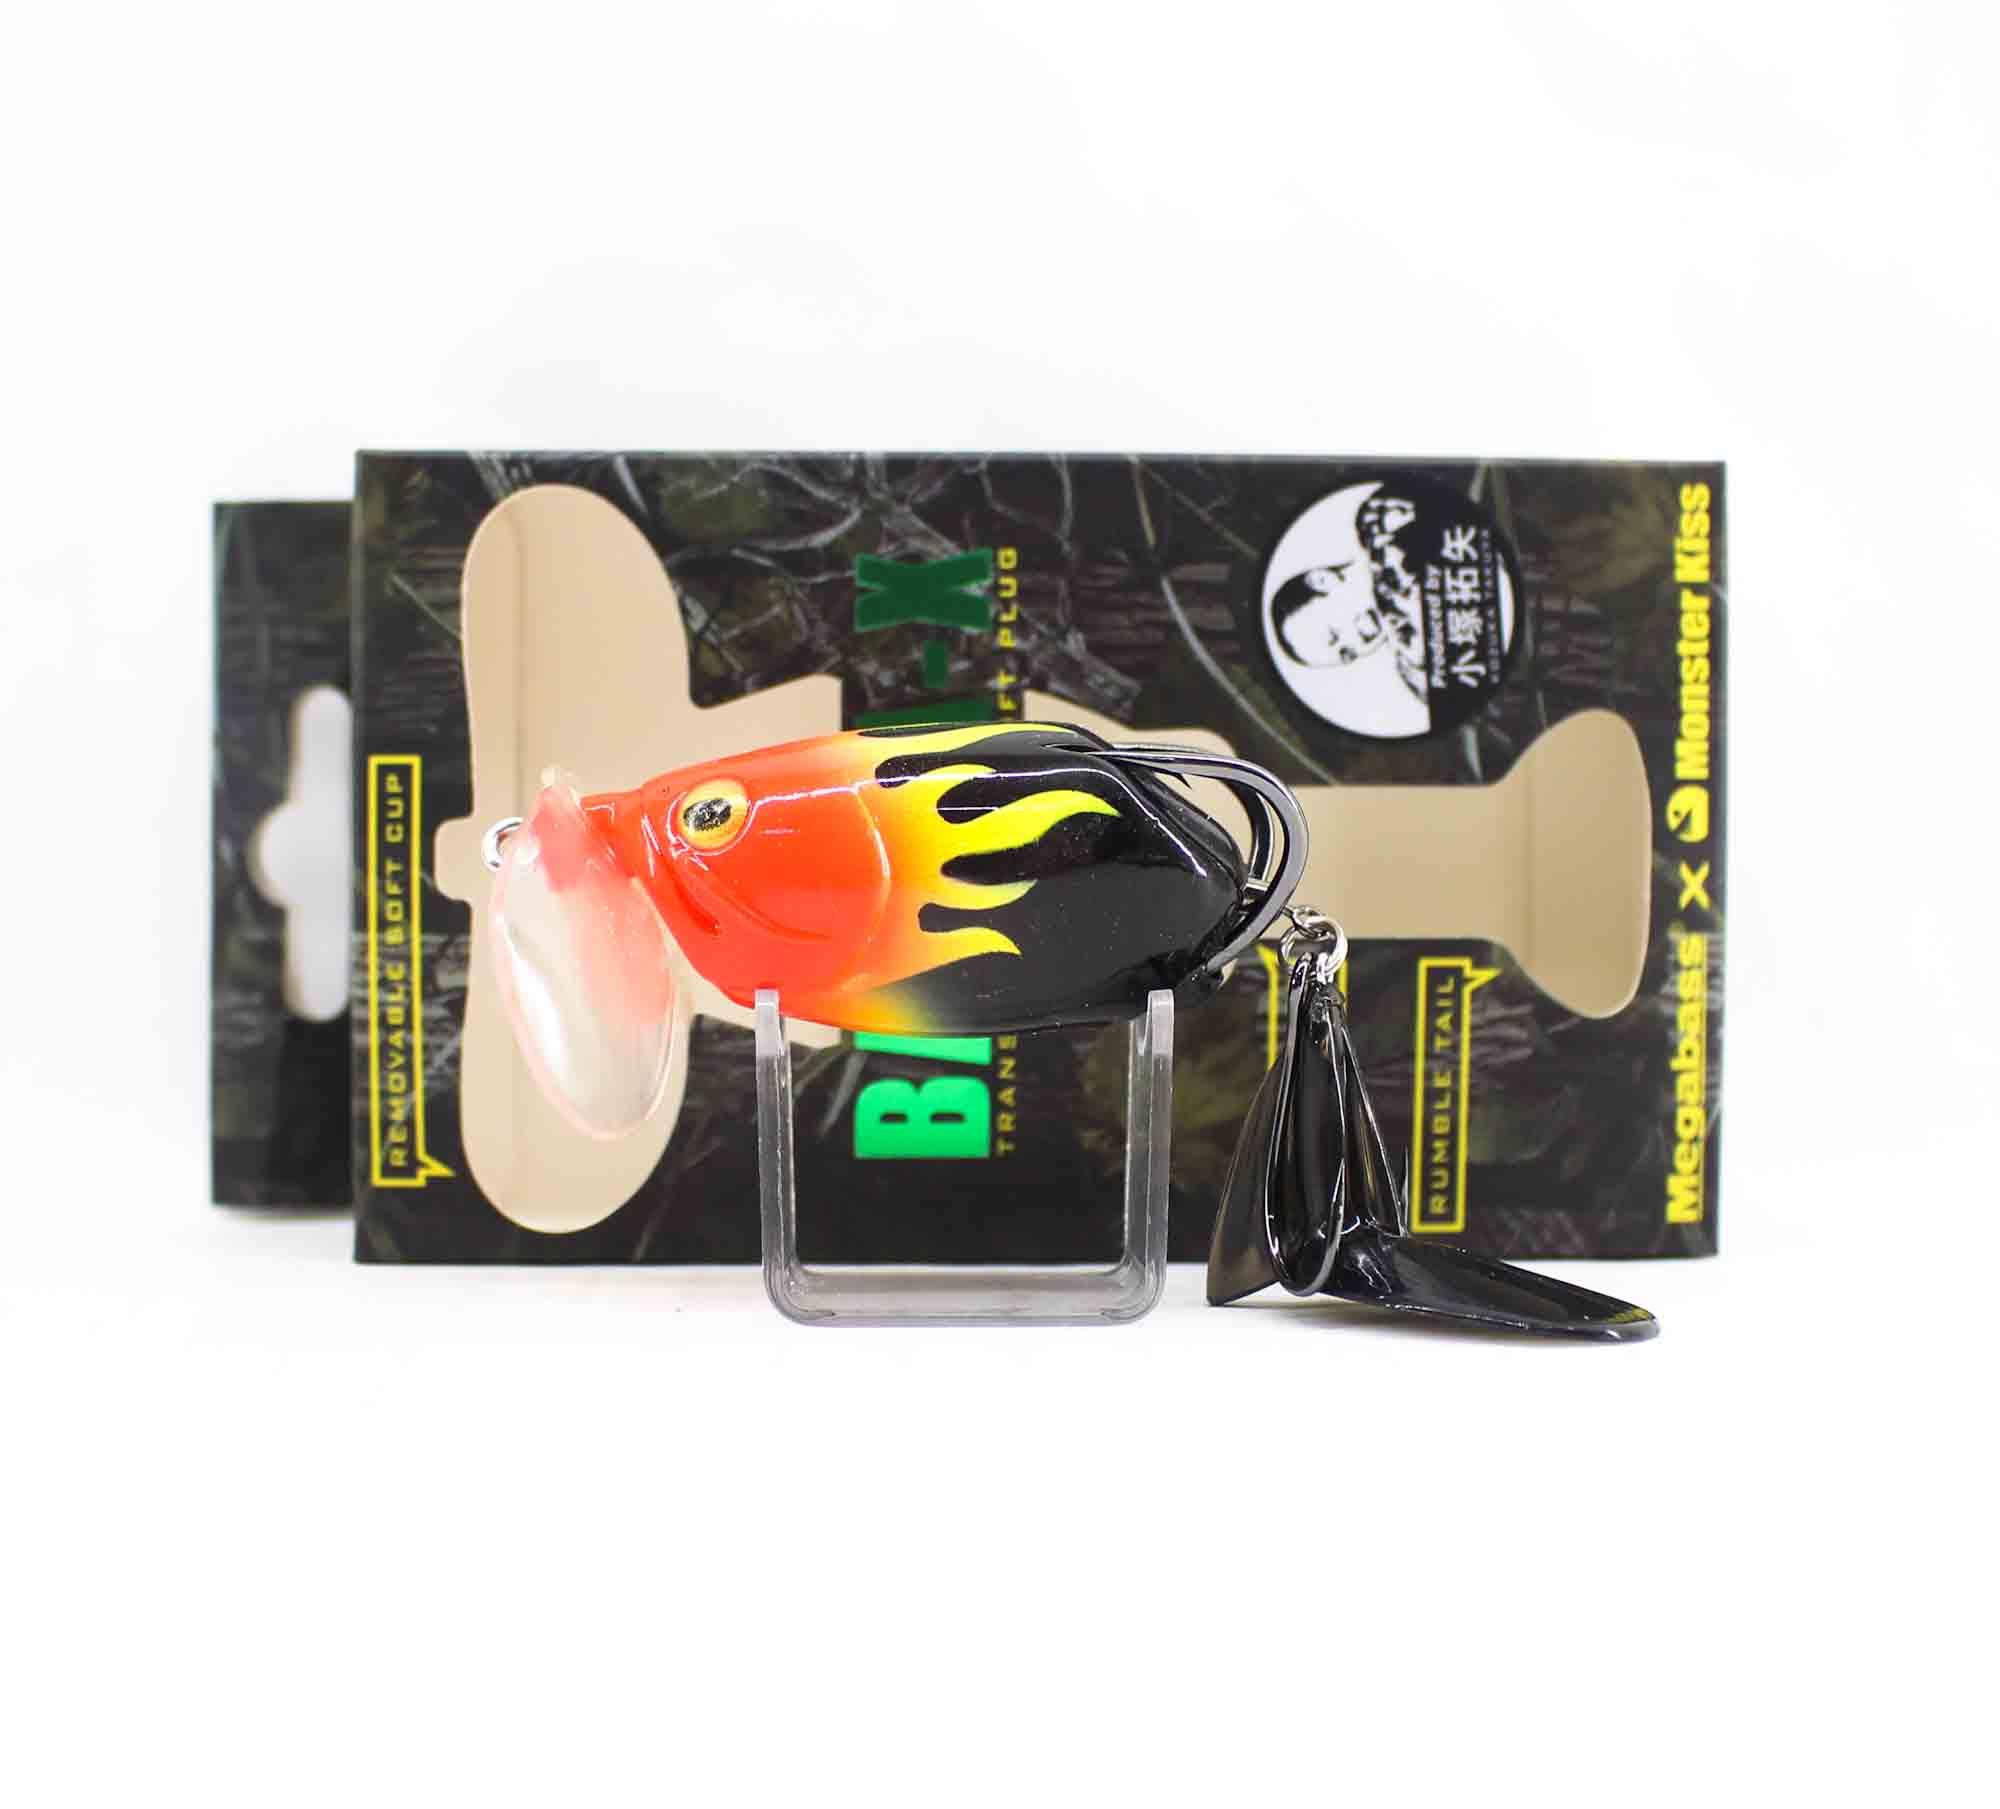 Megabass Batra-X Floating Lure Hot Rod Fire (6813)